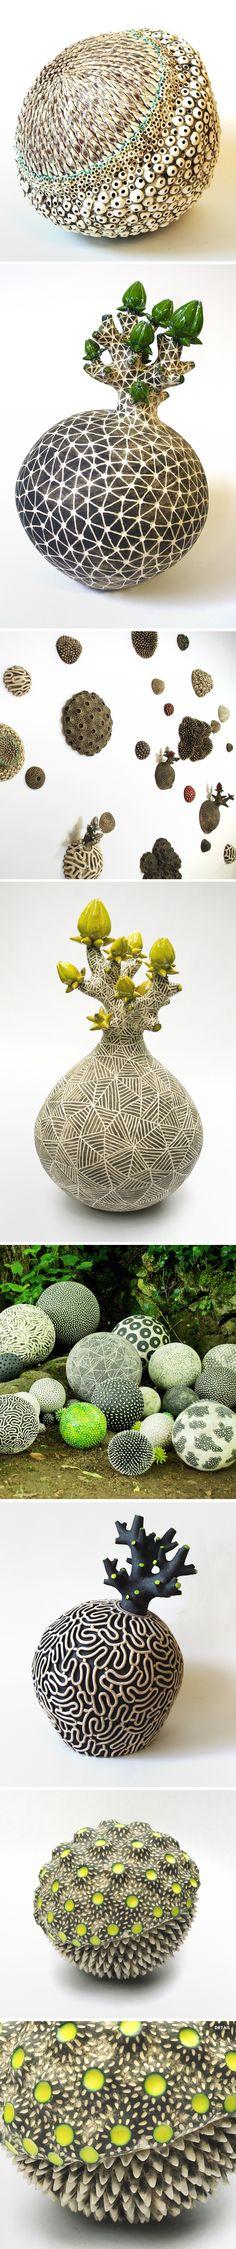 ceramics by éliane monnin